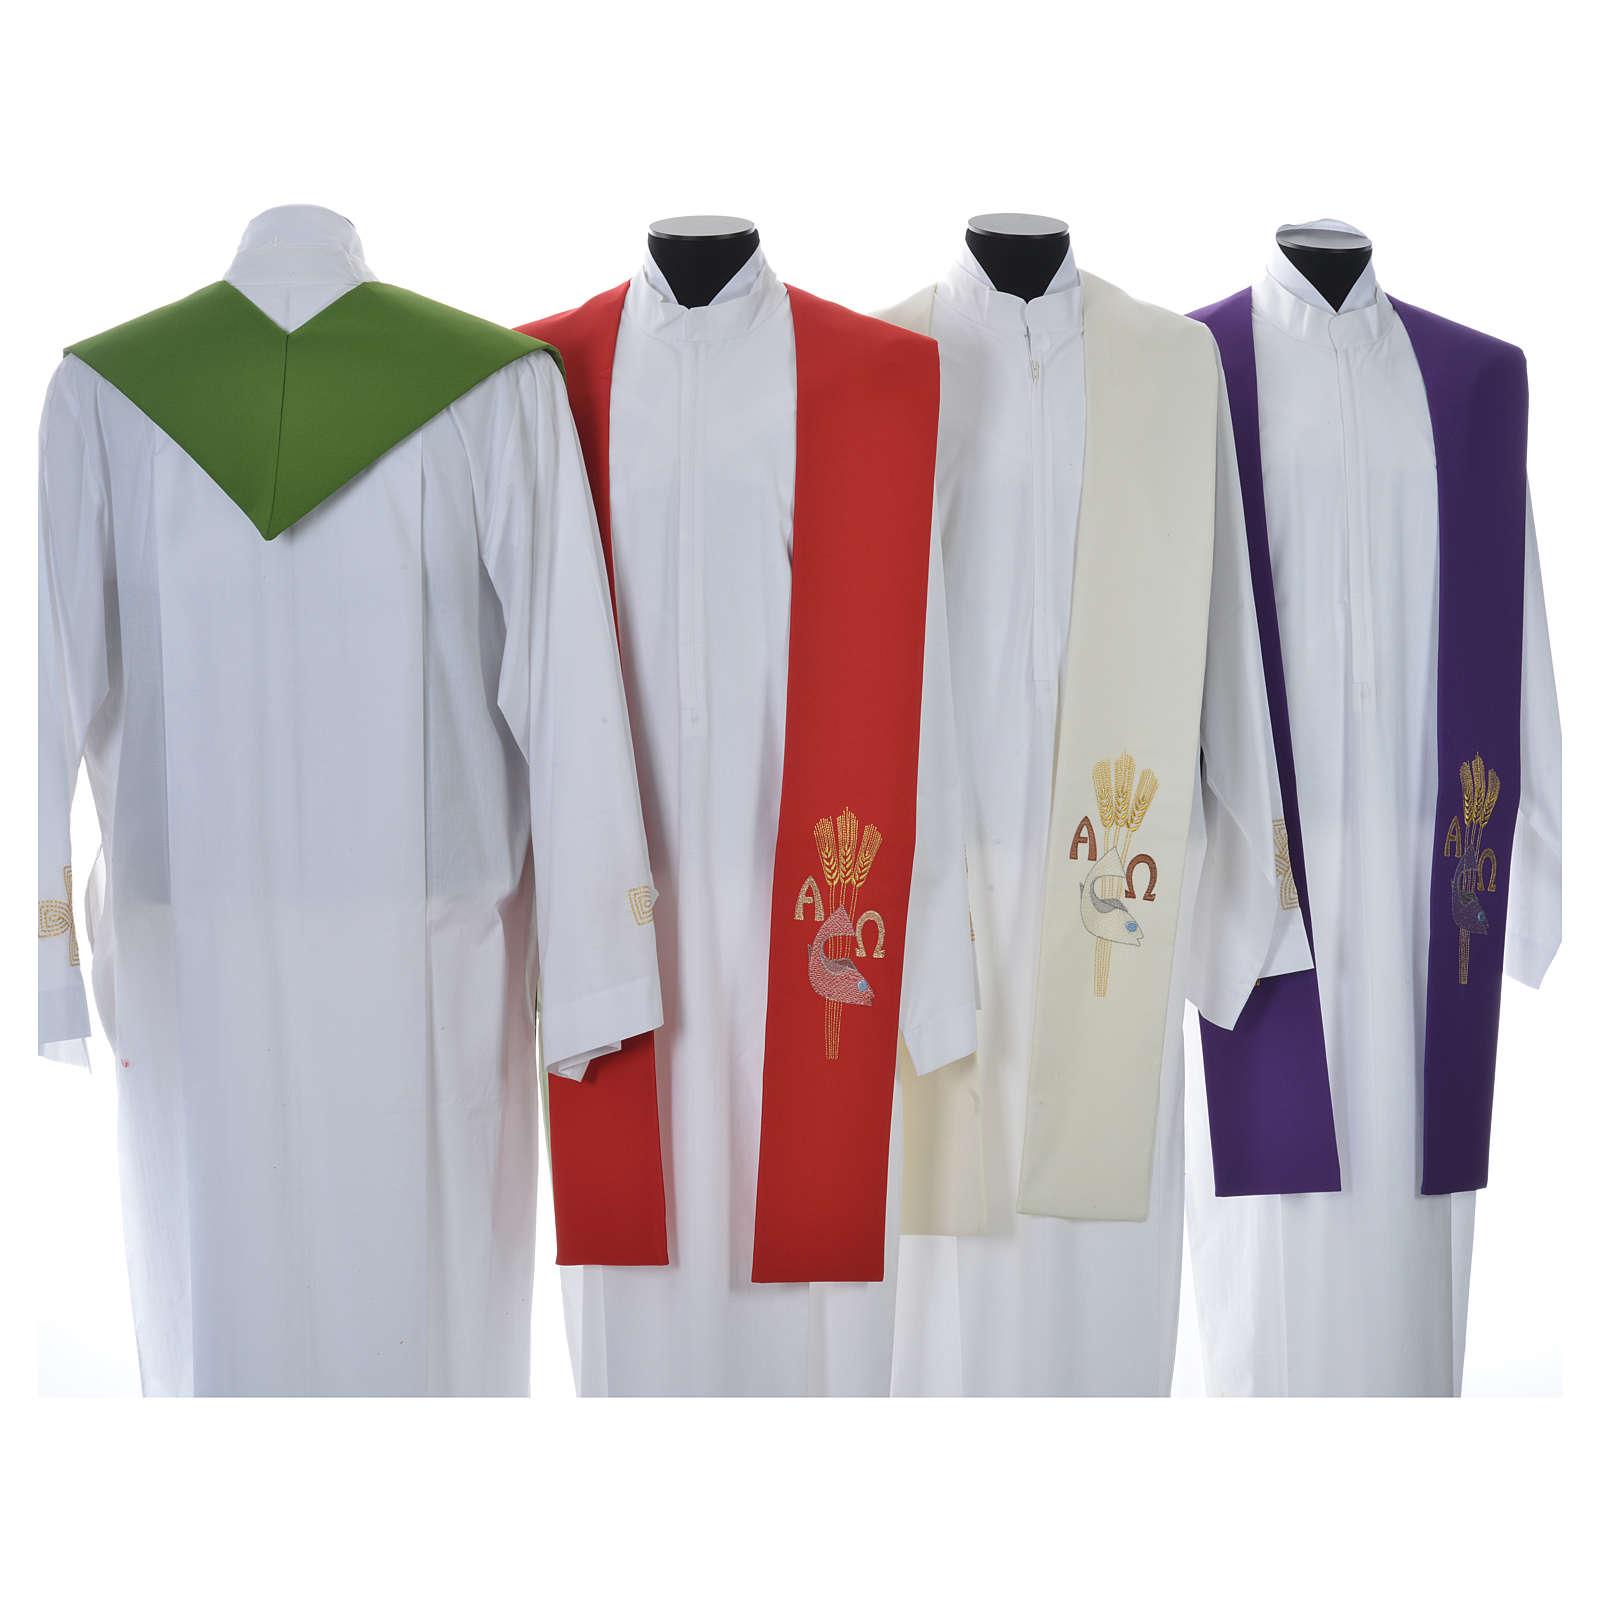 Étole de prêtre alpha oméga 4